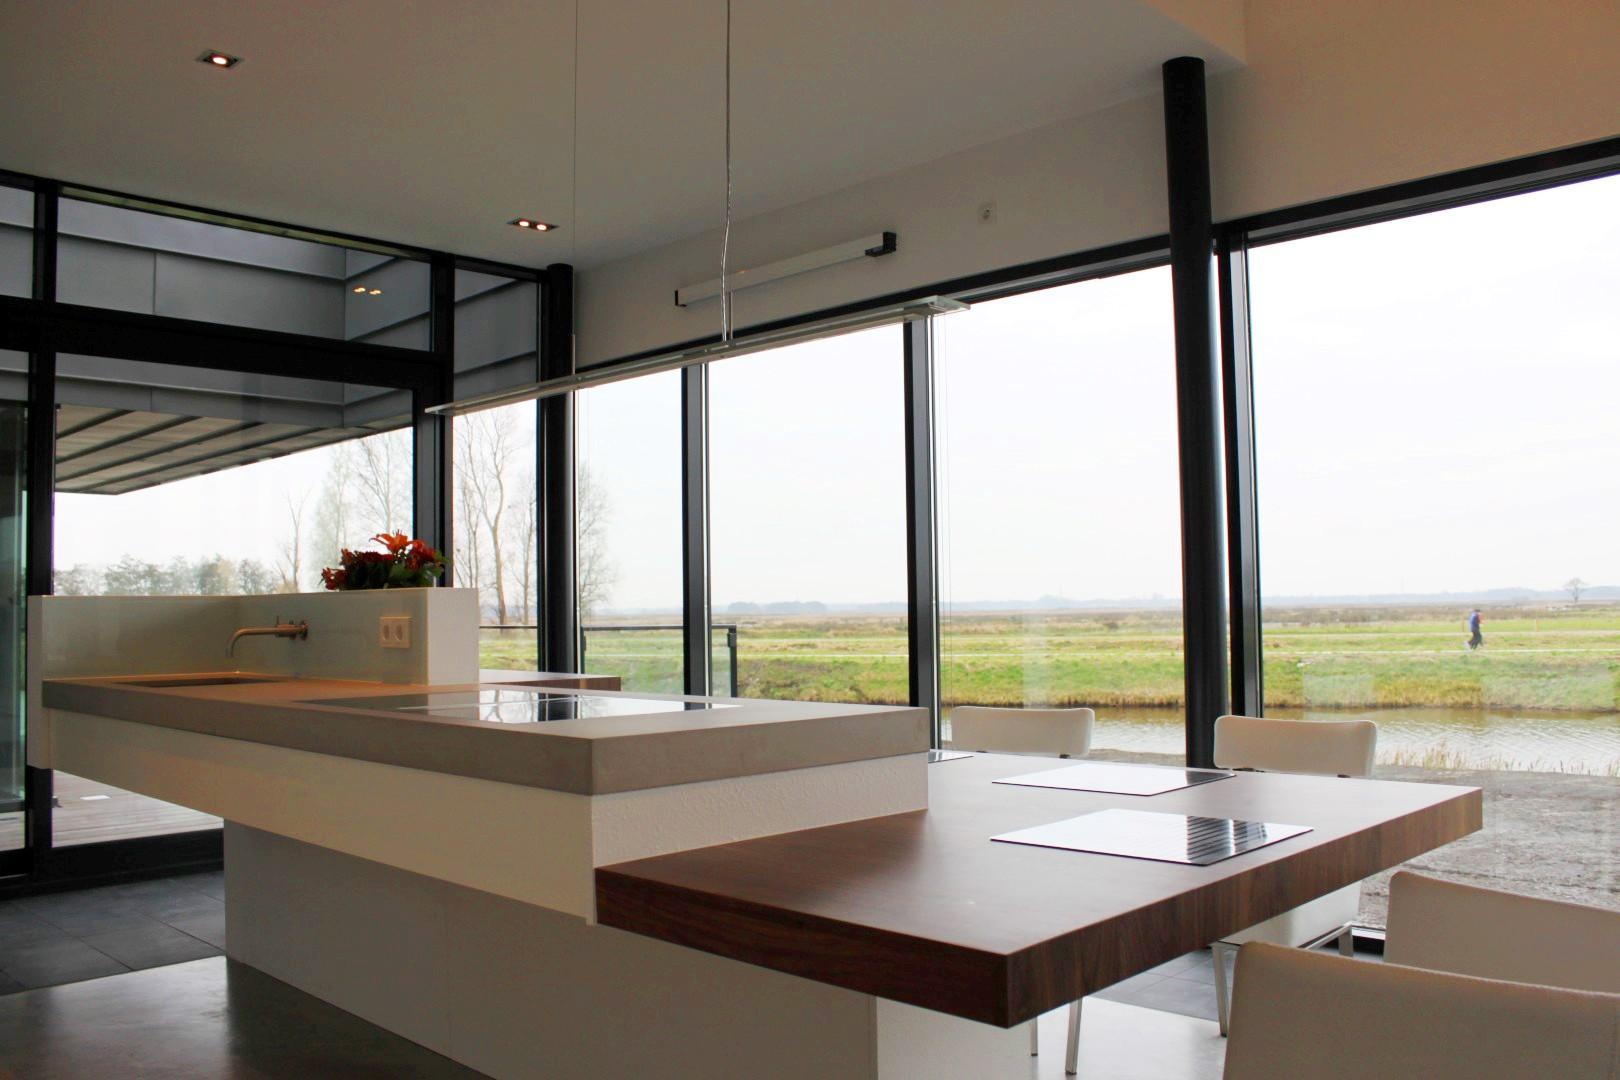 Bar Keuken Maken : Bar Keuken Maken : New Modern Handgemaakte houten keukens van